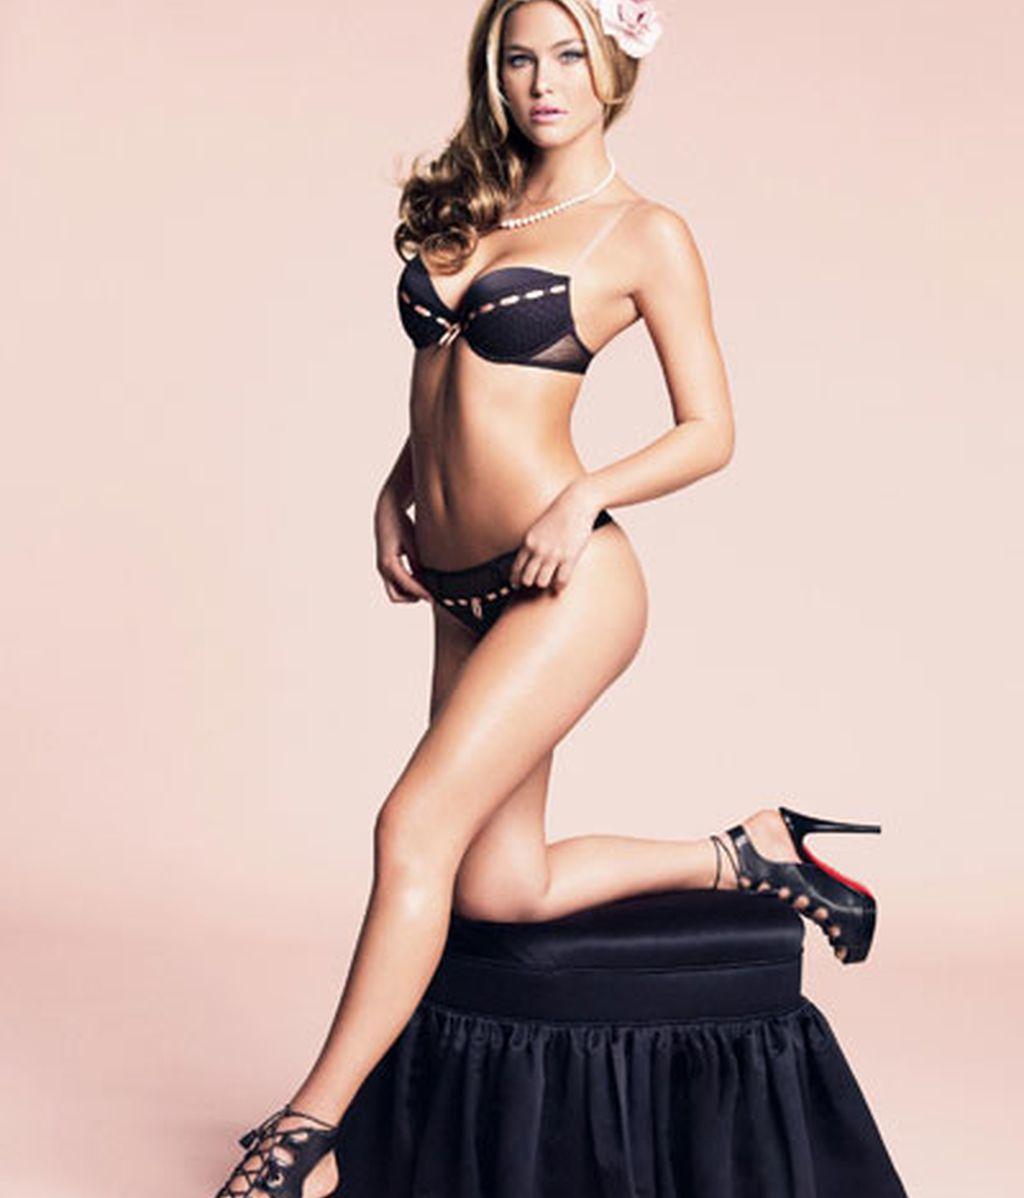 La novia de Leonardo DiCaprio se queda en sujetador